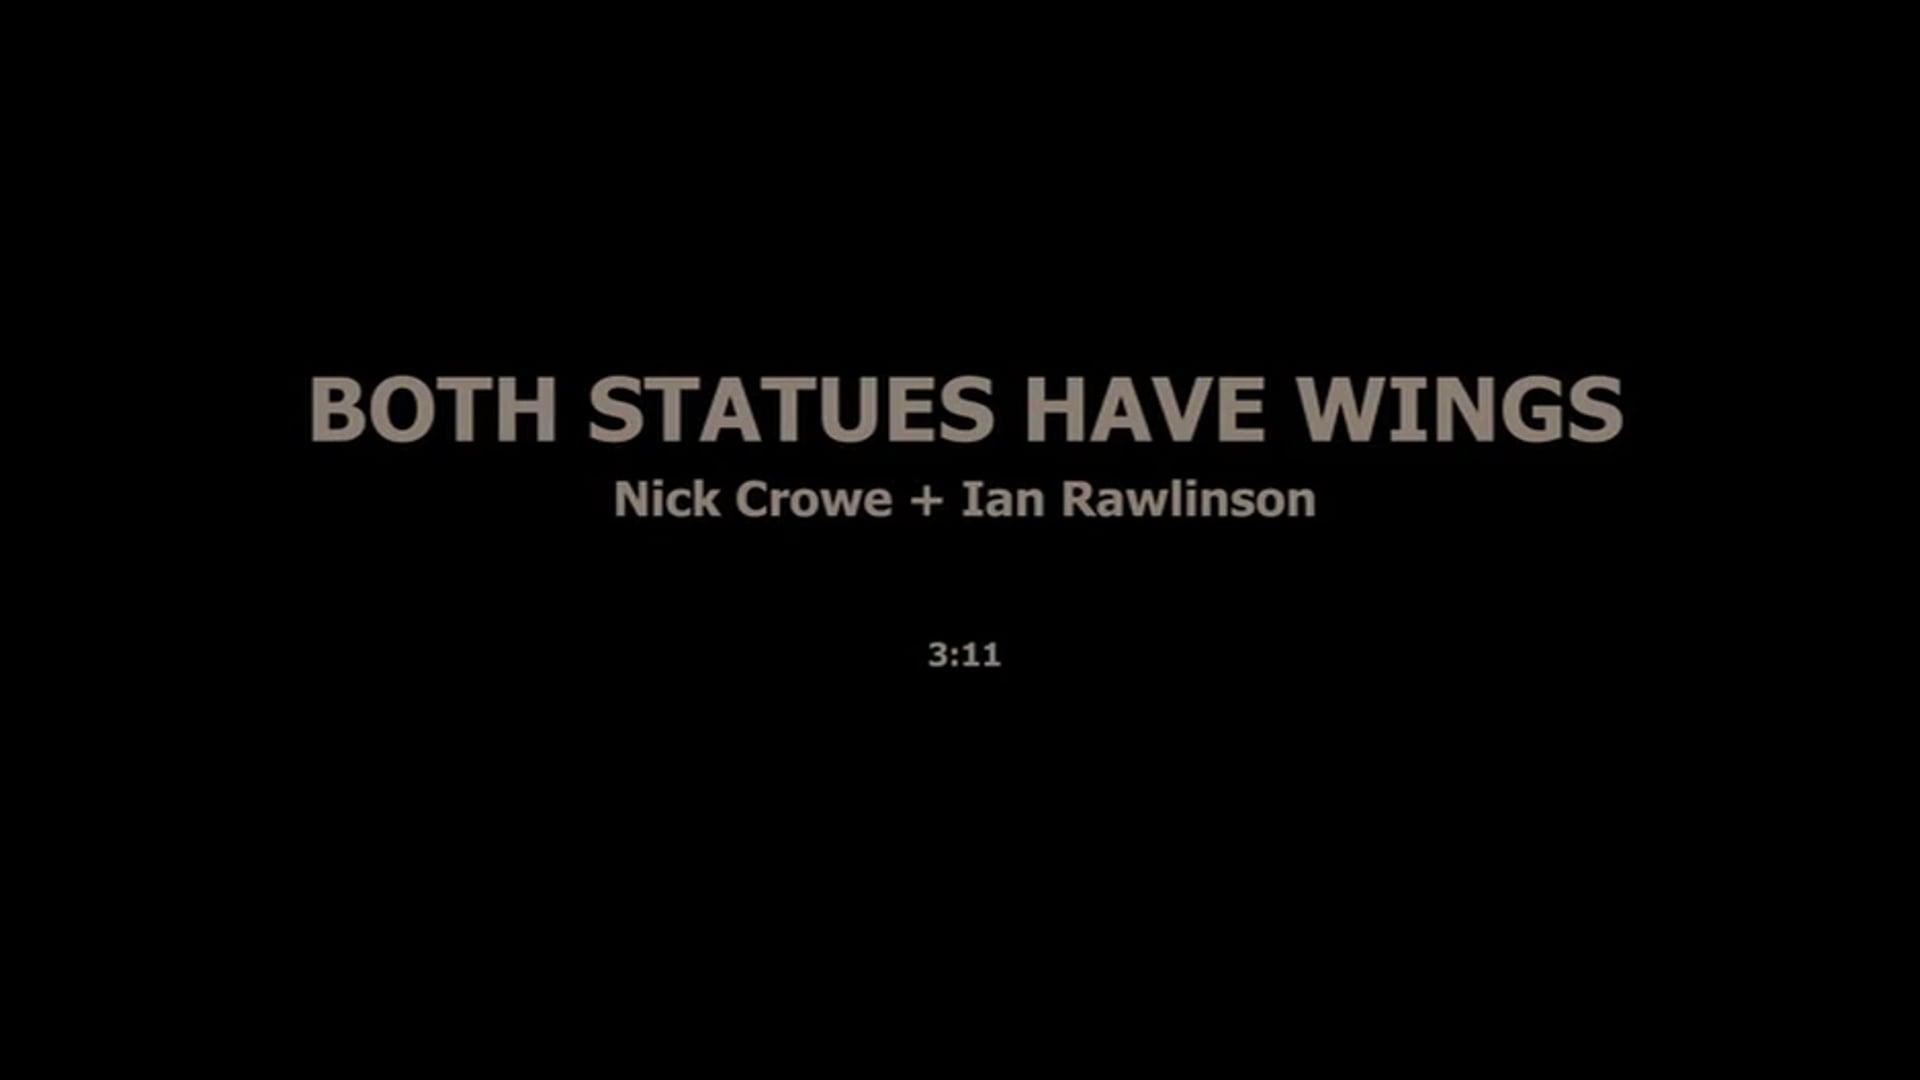 BOTH STATUES HAVE WINGS - NICK CROVE, IAN RAWLINSON